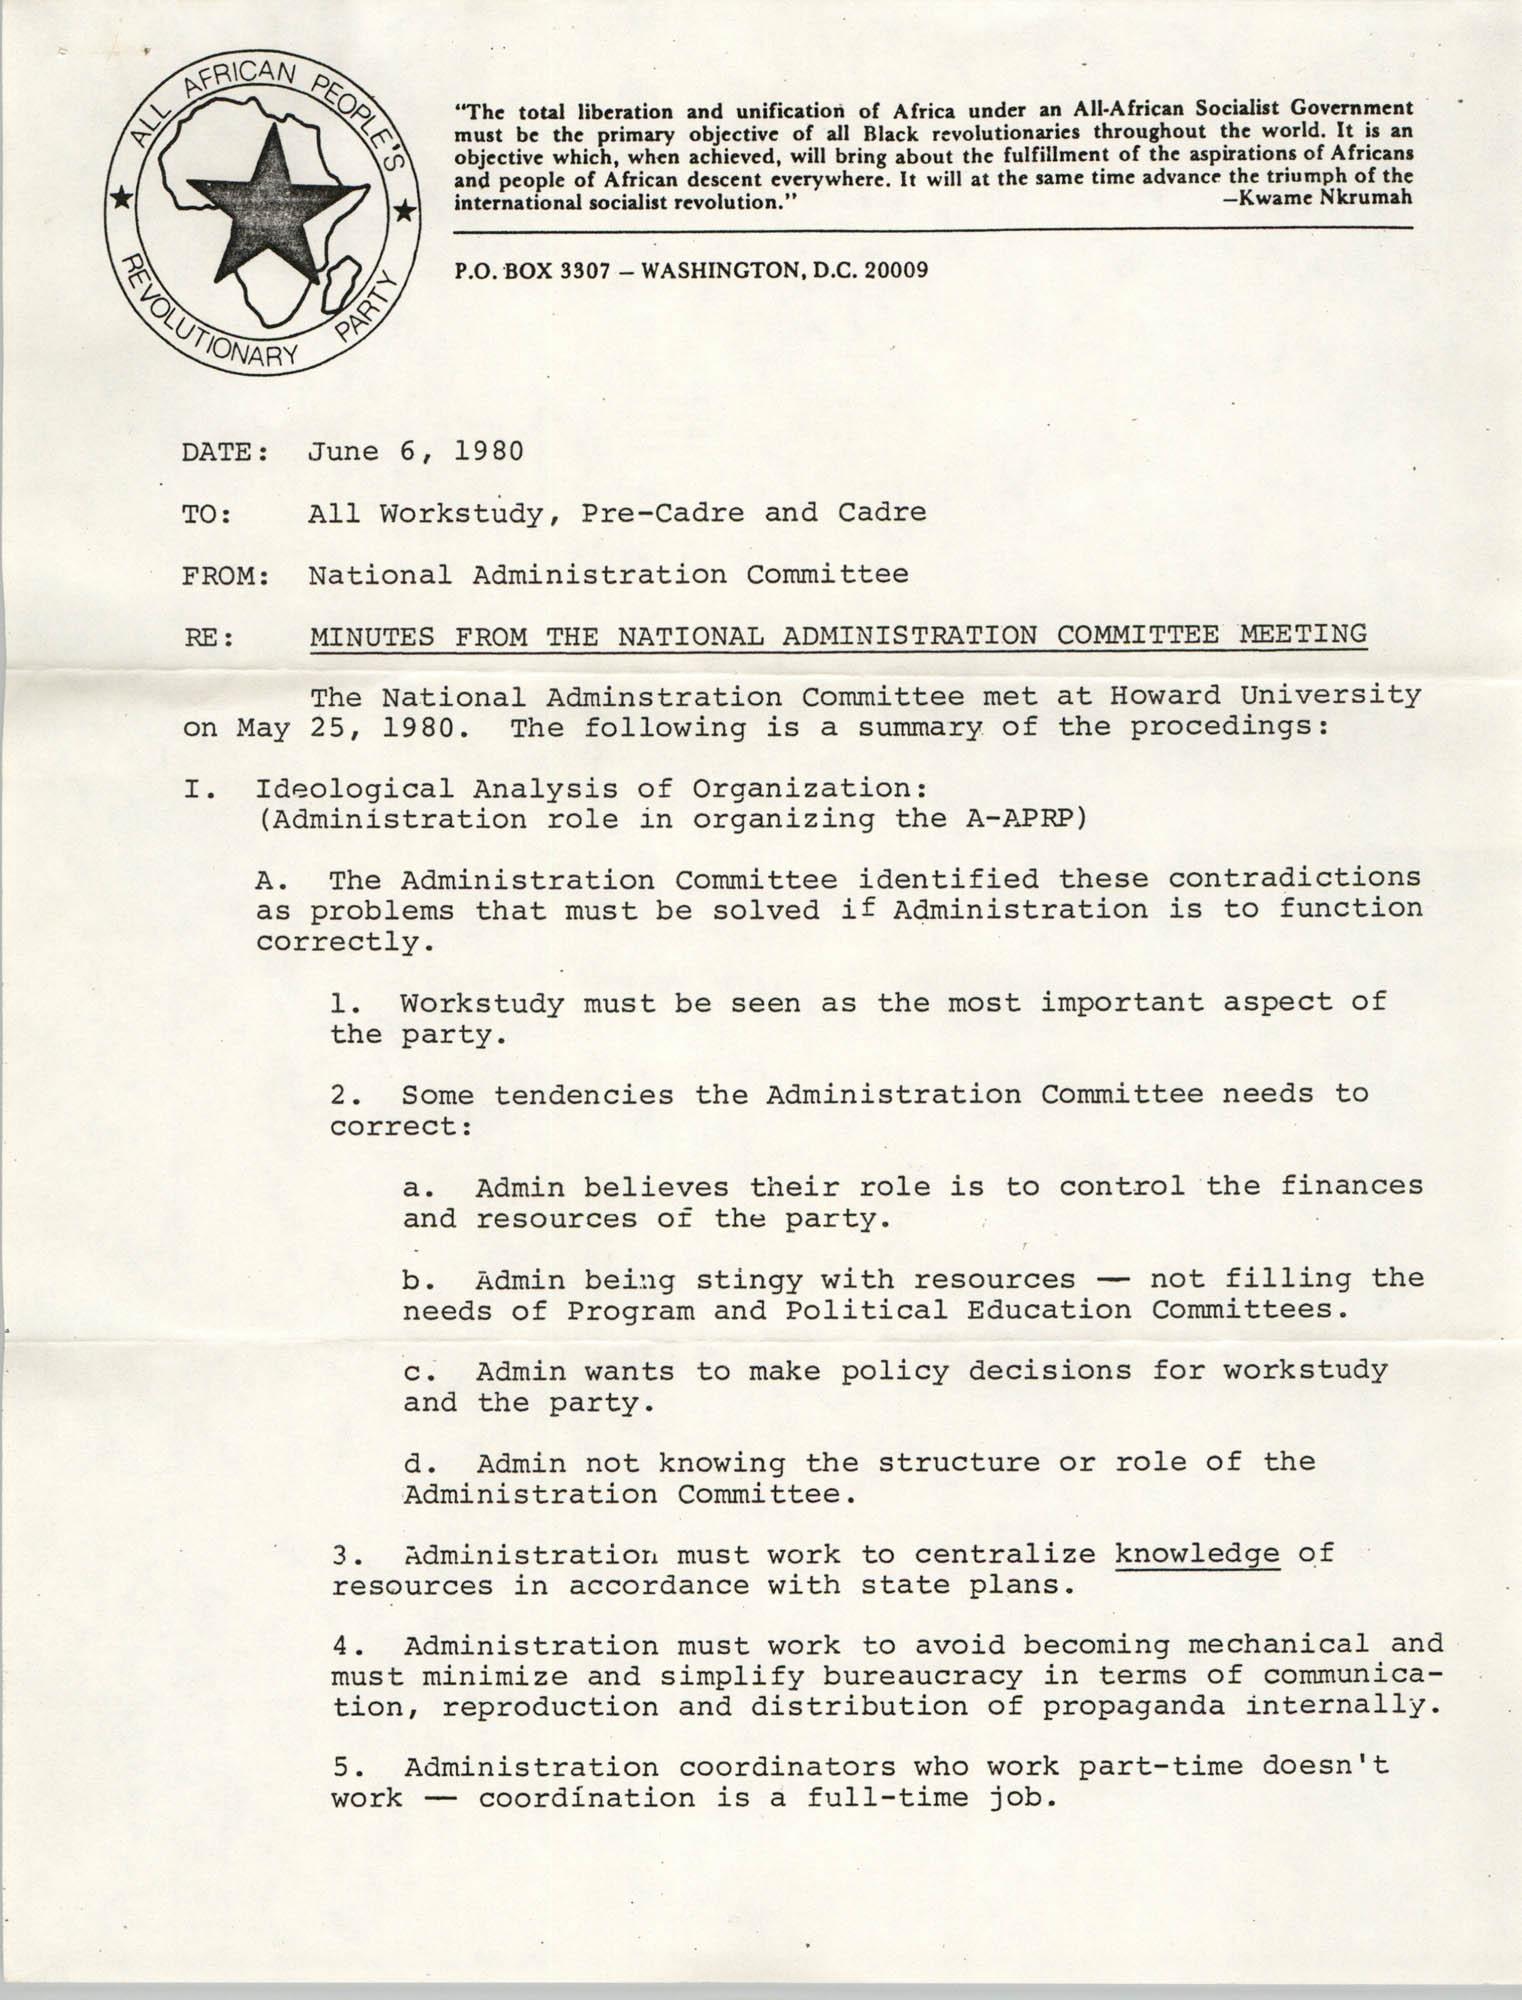 All African People's Revolutionary Party Memorandum, June 6, 1980